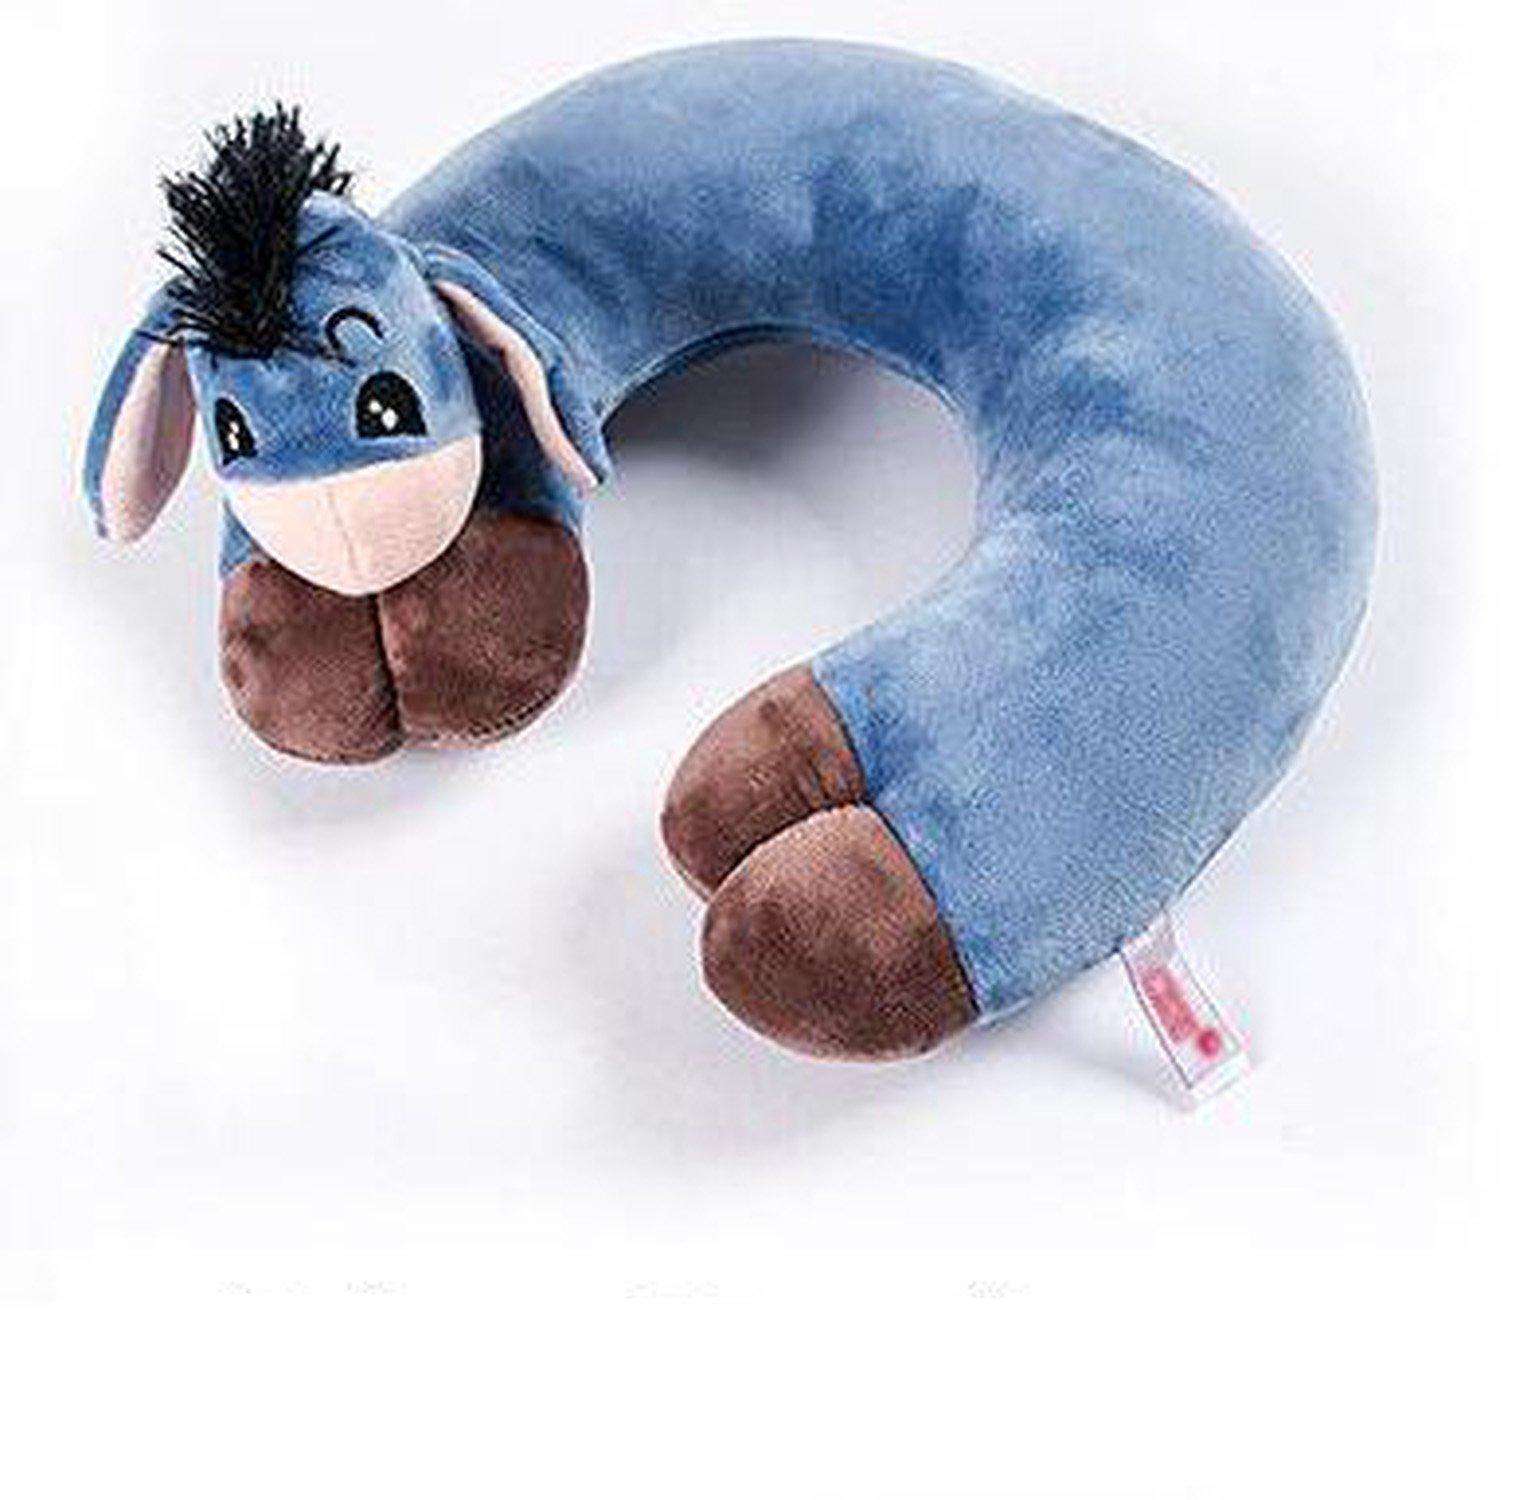 Bansca Cartoon U Animal Shape Decorative Neck Pillows Home Pillows Cushions Neck Pillows For Travel Office Dream Car,Donkey,30X30X9 Cm